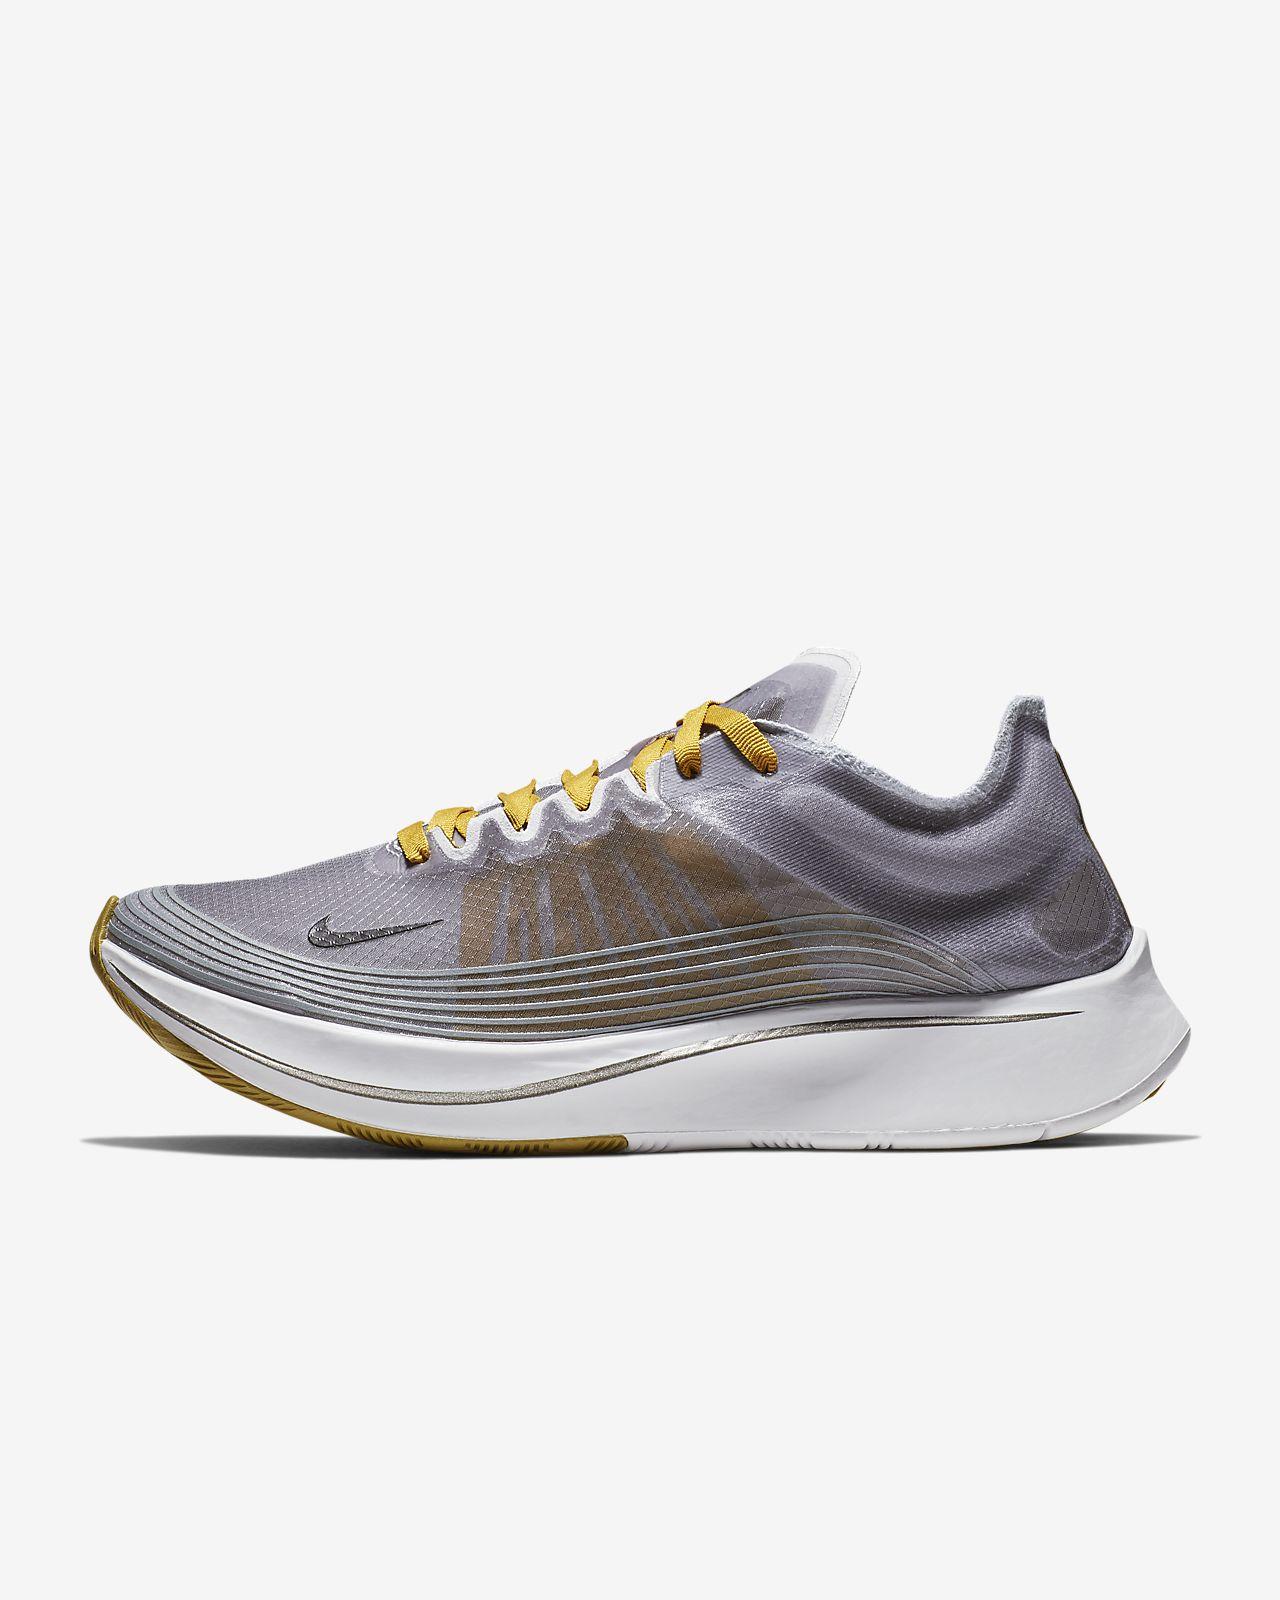 Calzado de running para mujer Nike Zoom Fly SP